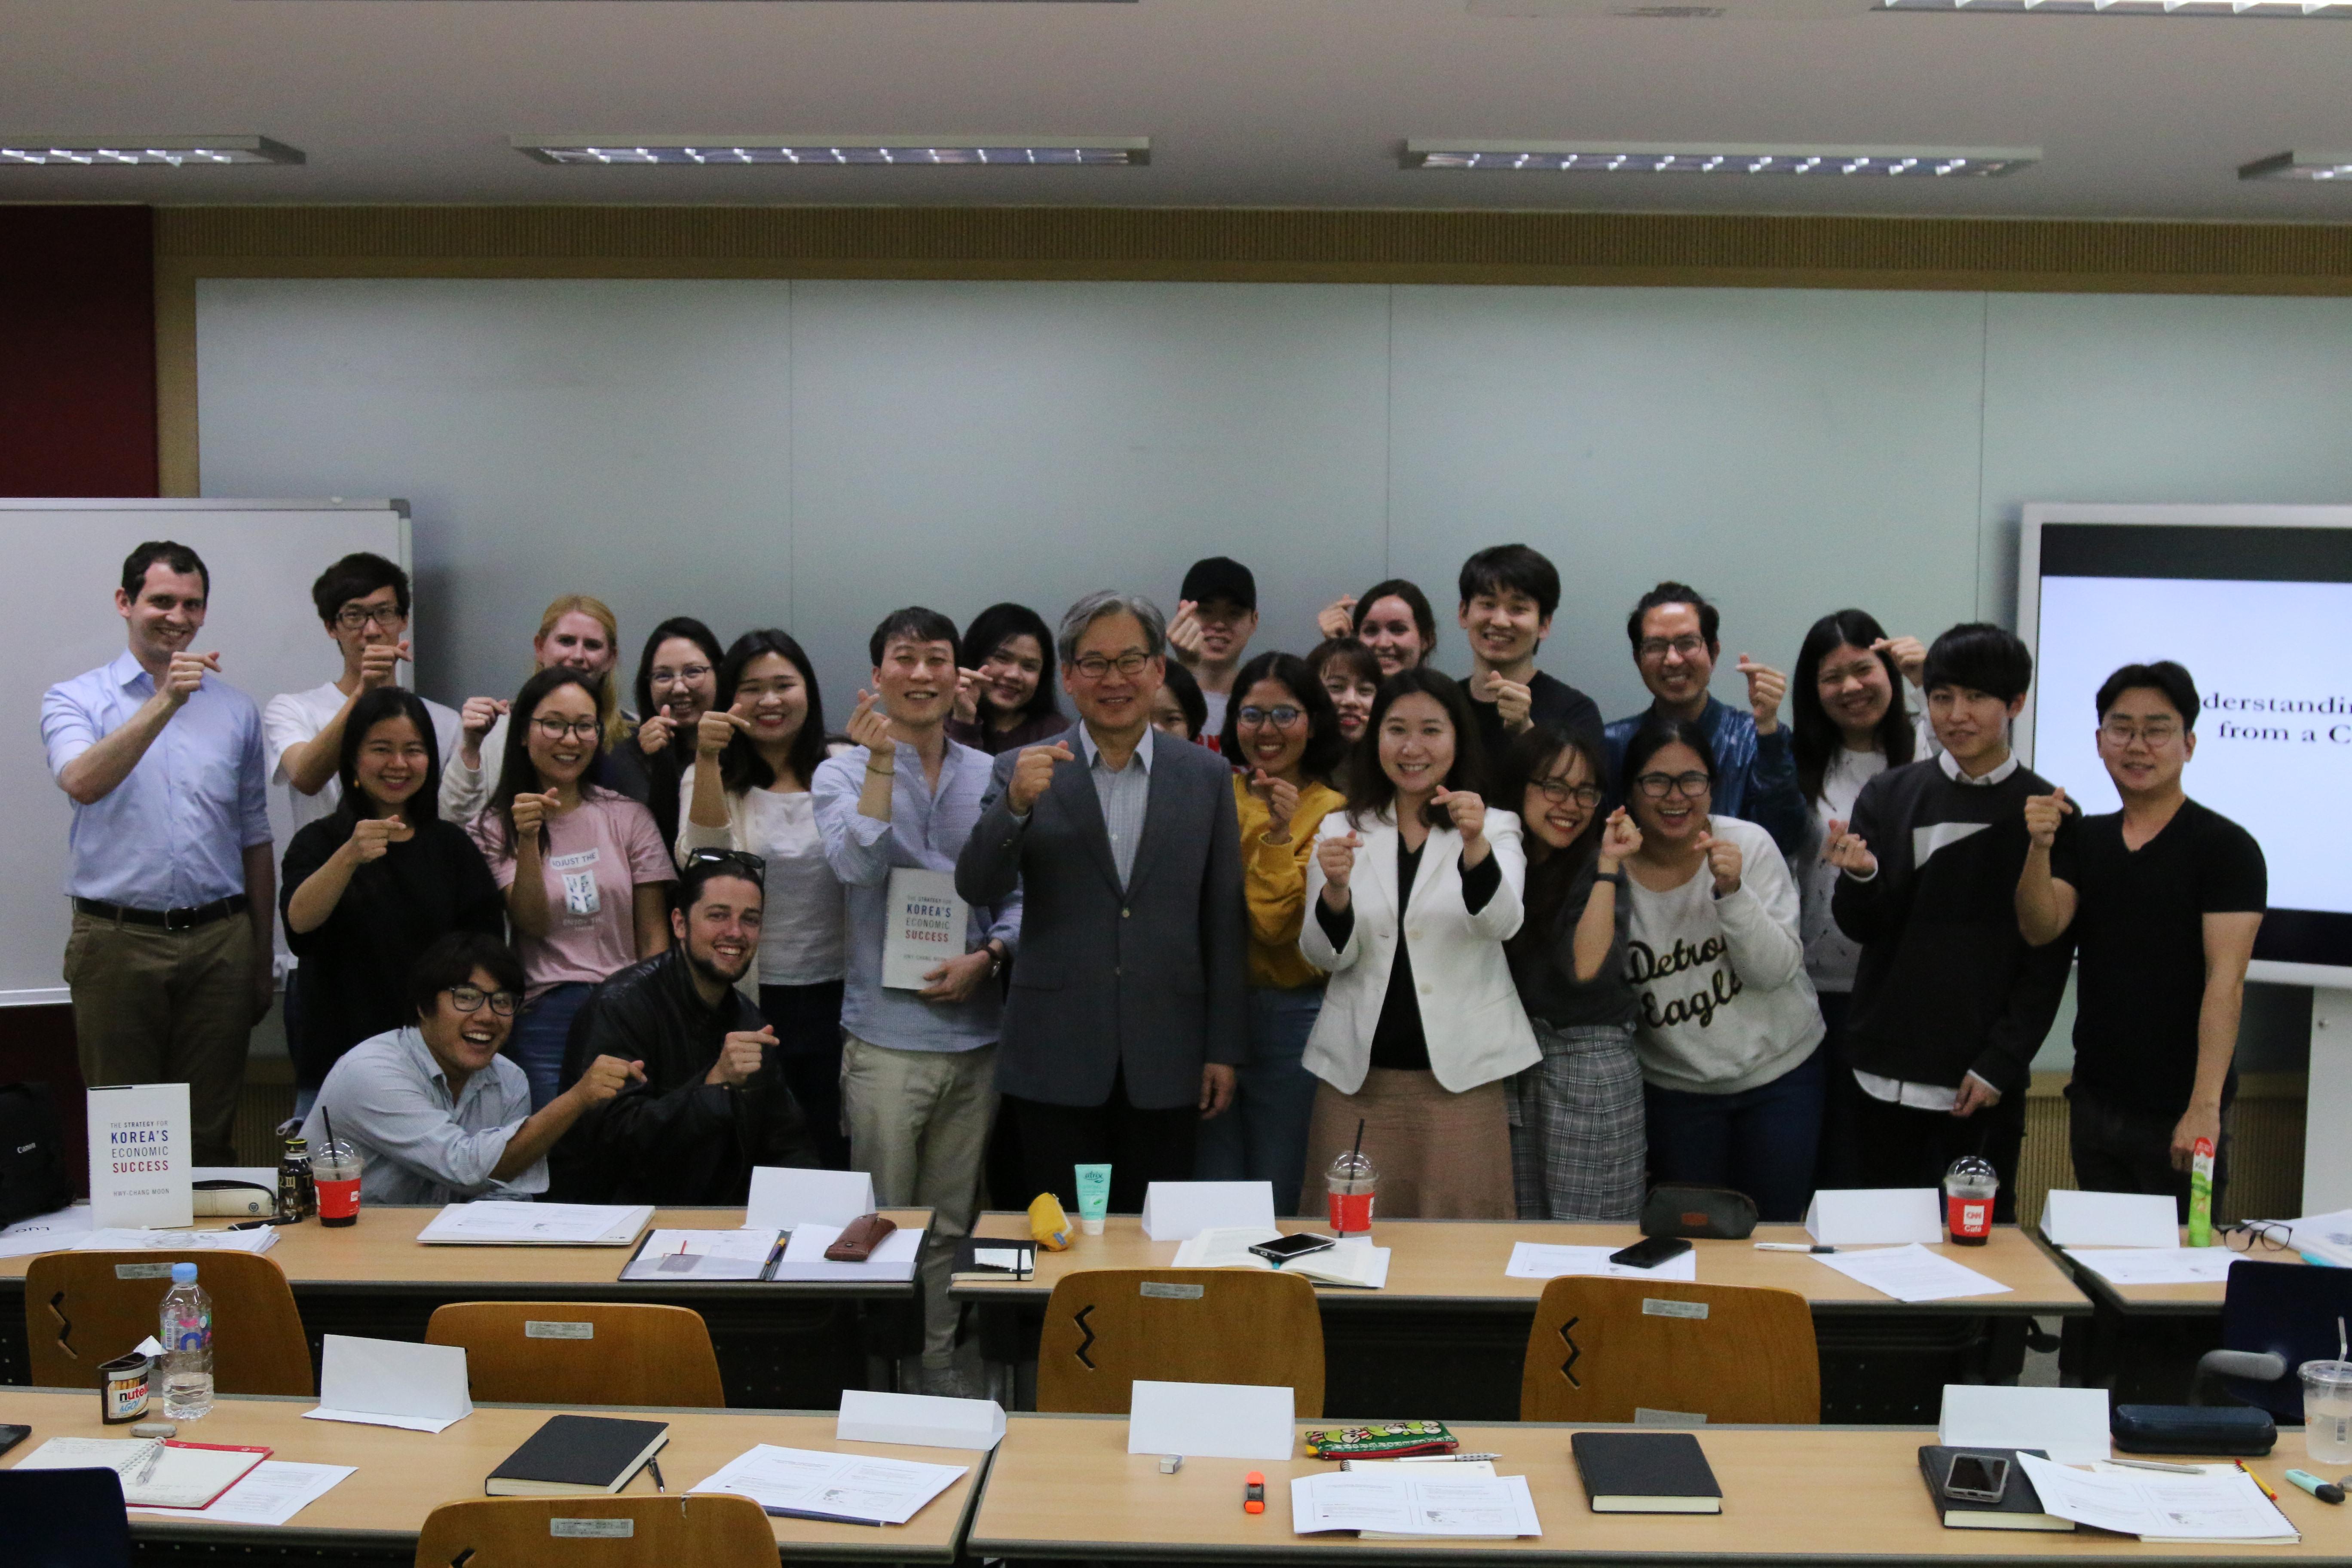 Moon_Last Class at SNU